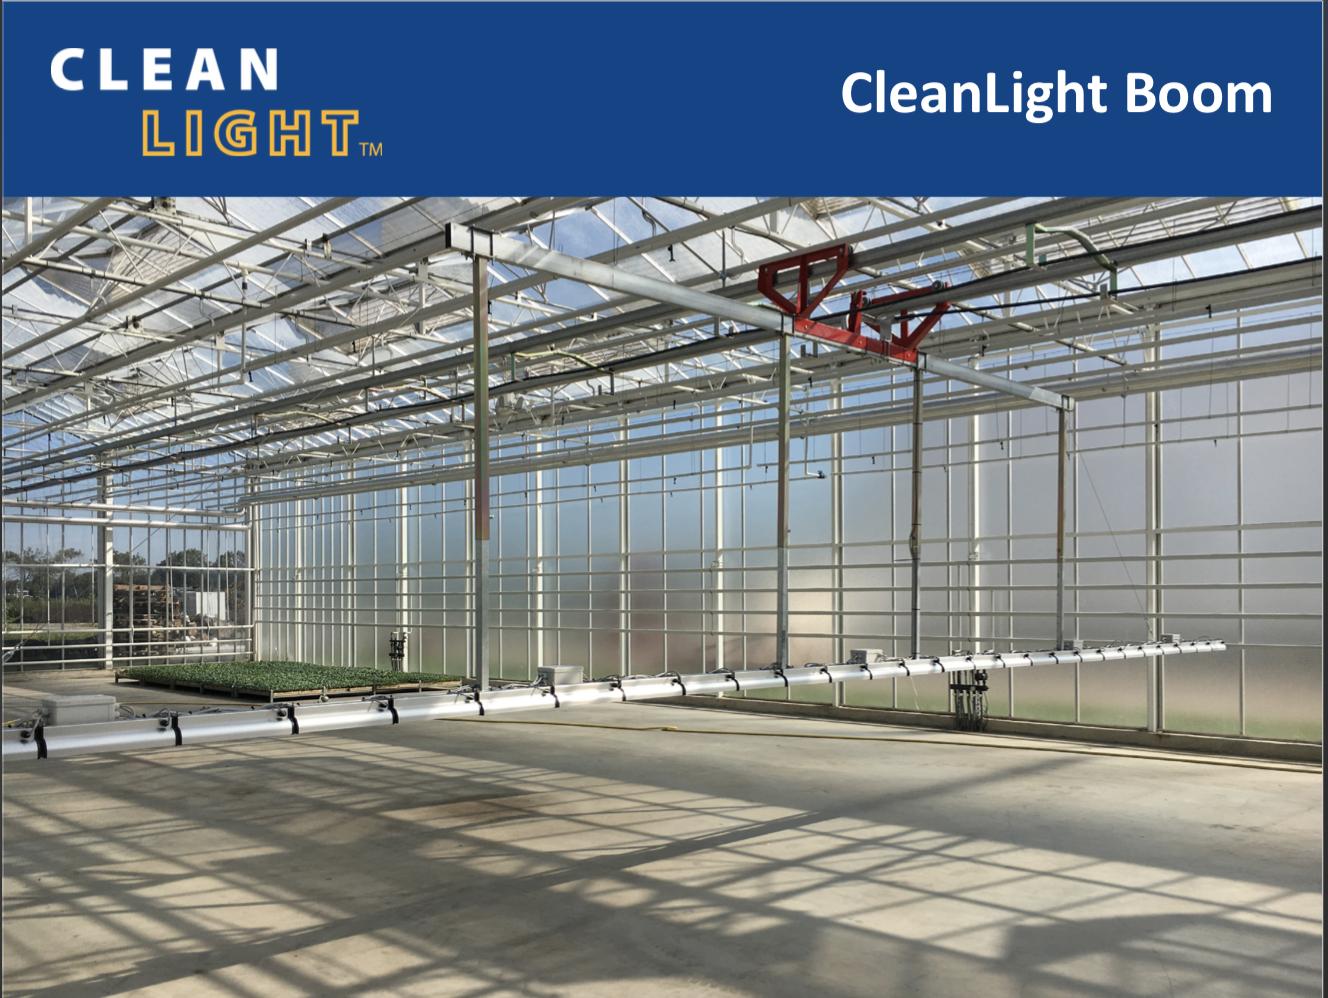 Productsheet CleanLight Boom